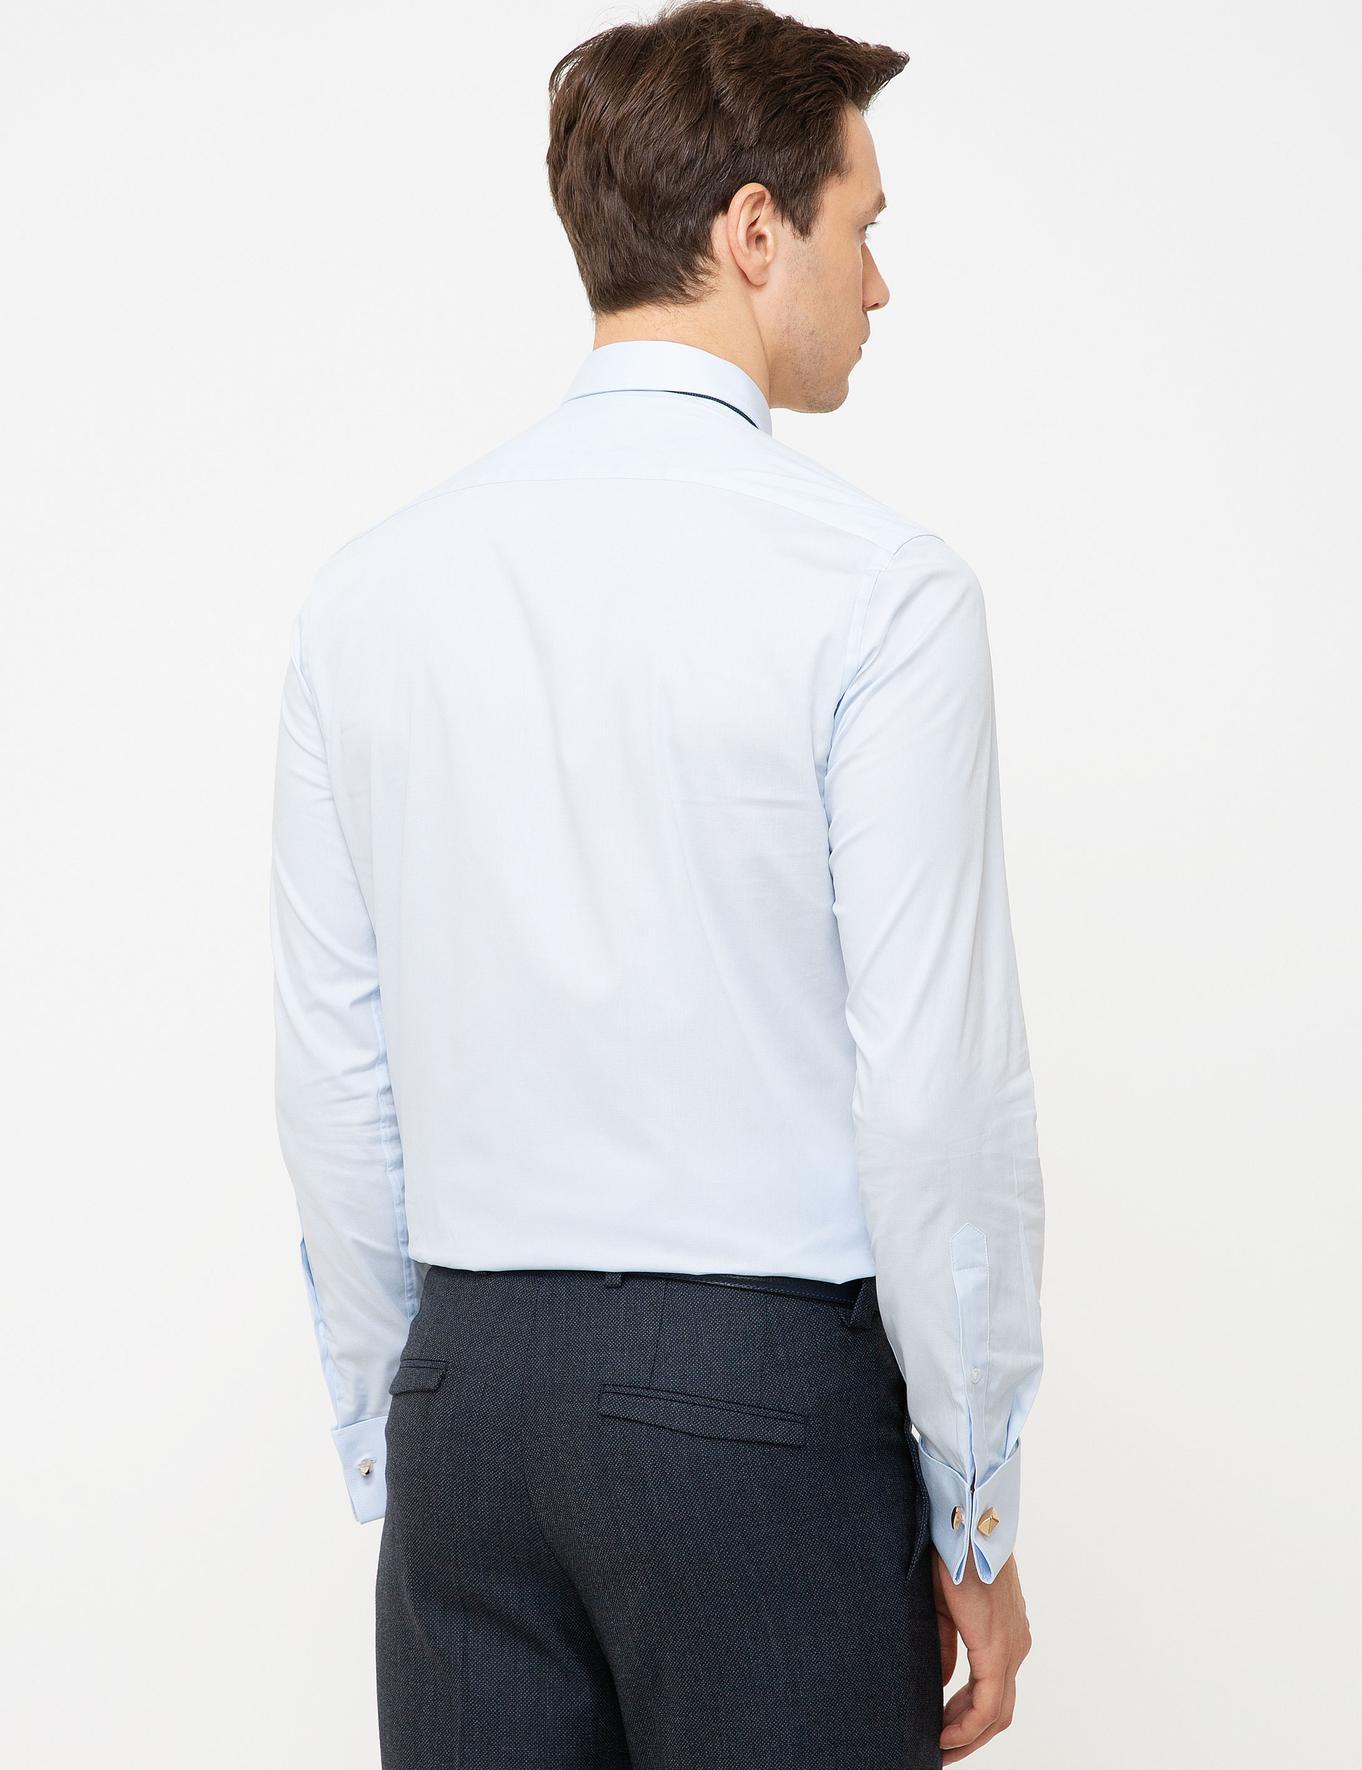 Açık Mavi Slim Fit Gömlek - 50197789035